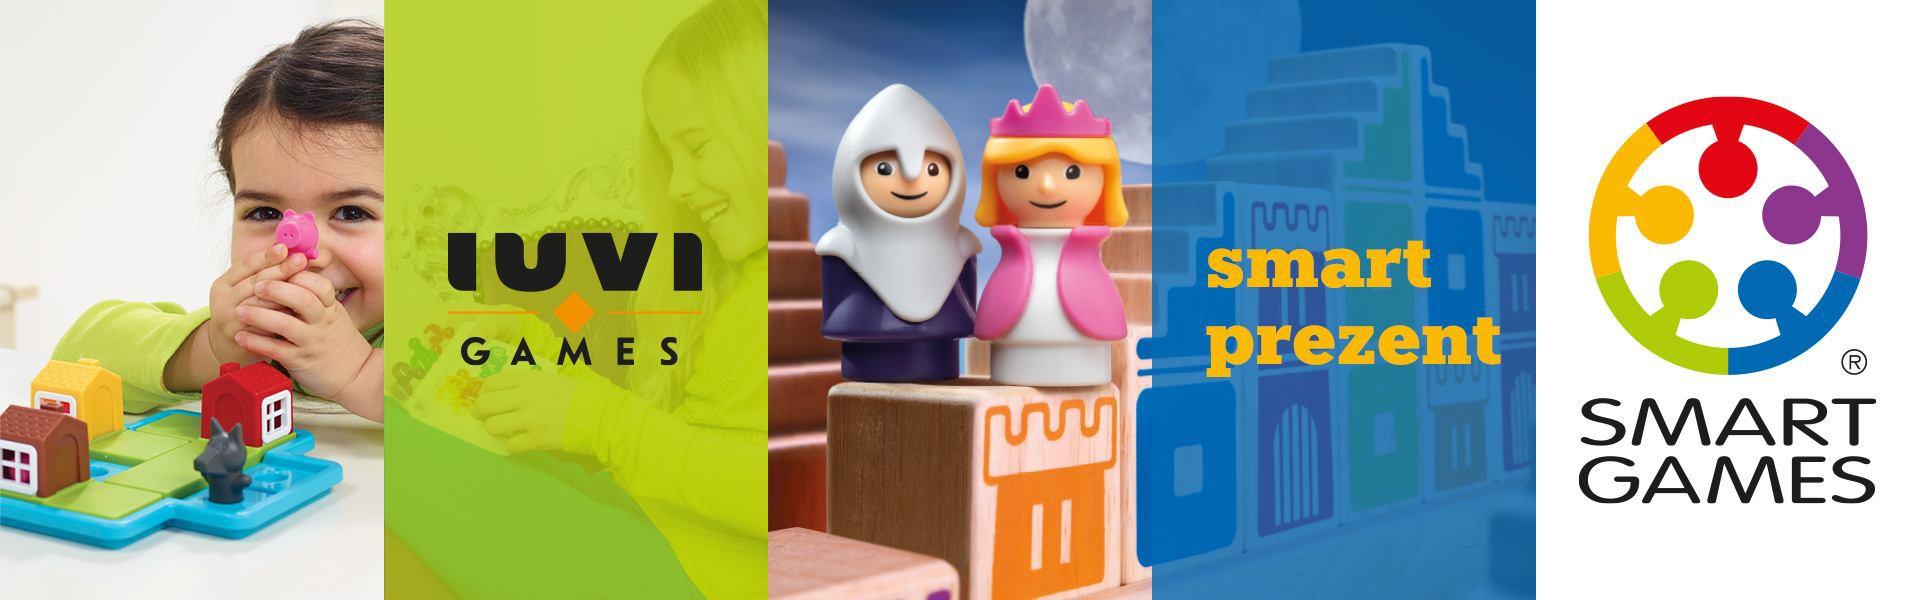 Smart Games od IUVI Games - Gry jako idealny prezent